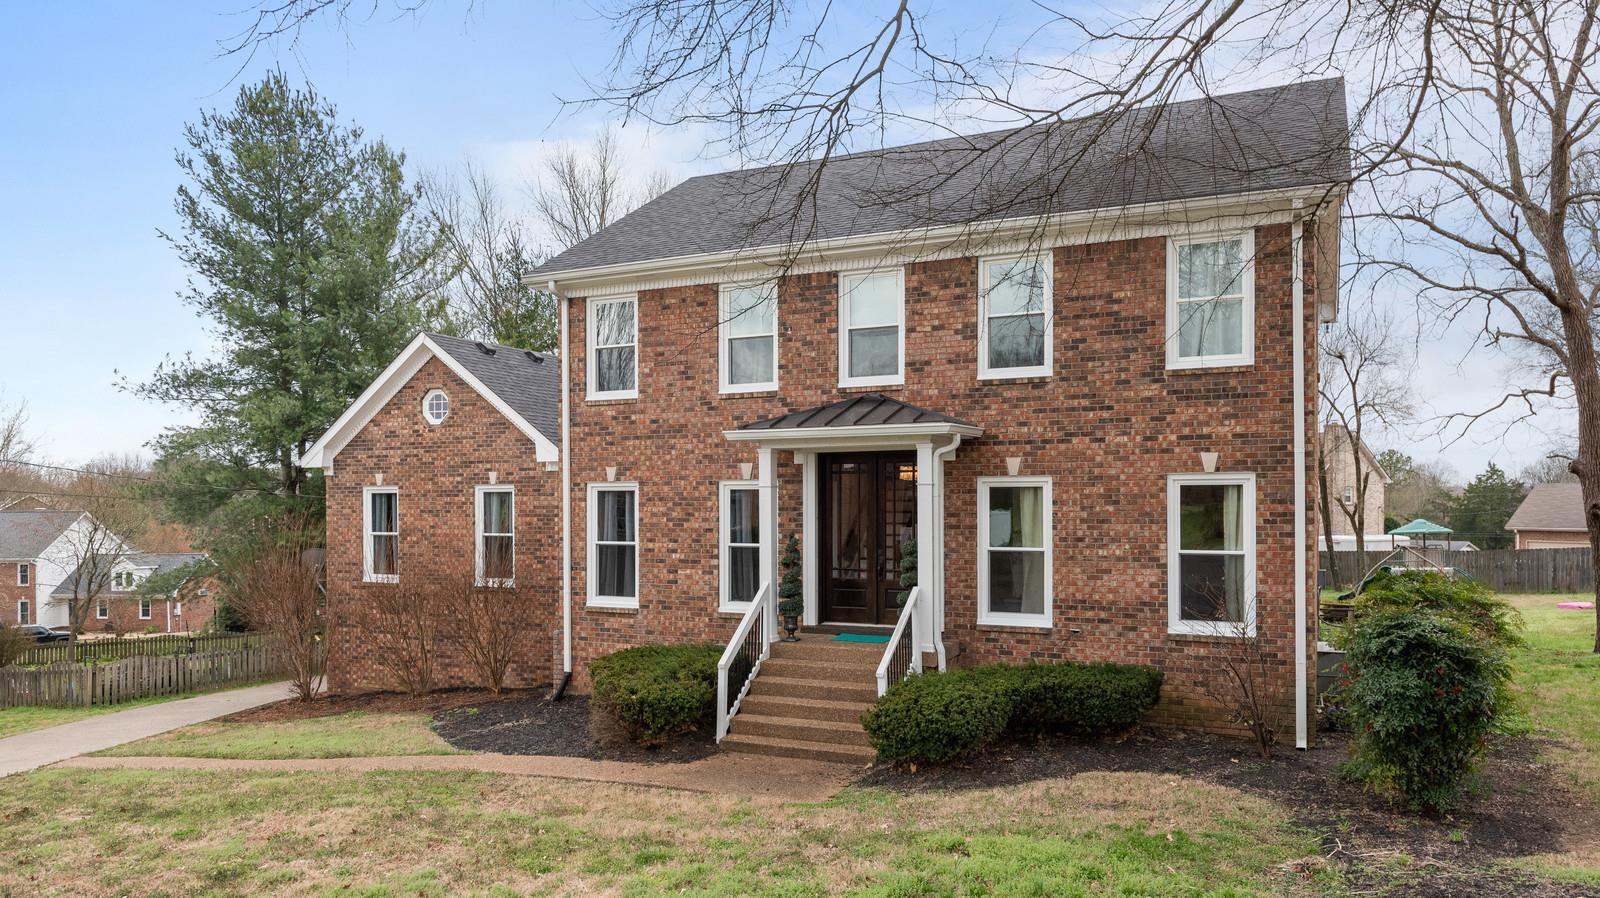 103 Downing Ct, Hendersonville, TN 37075 - Hendersonville, TN real estate listing